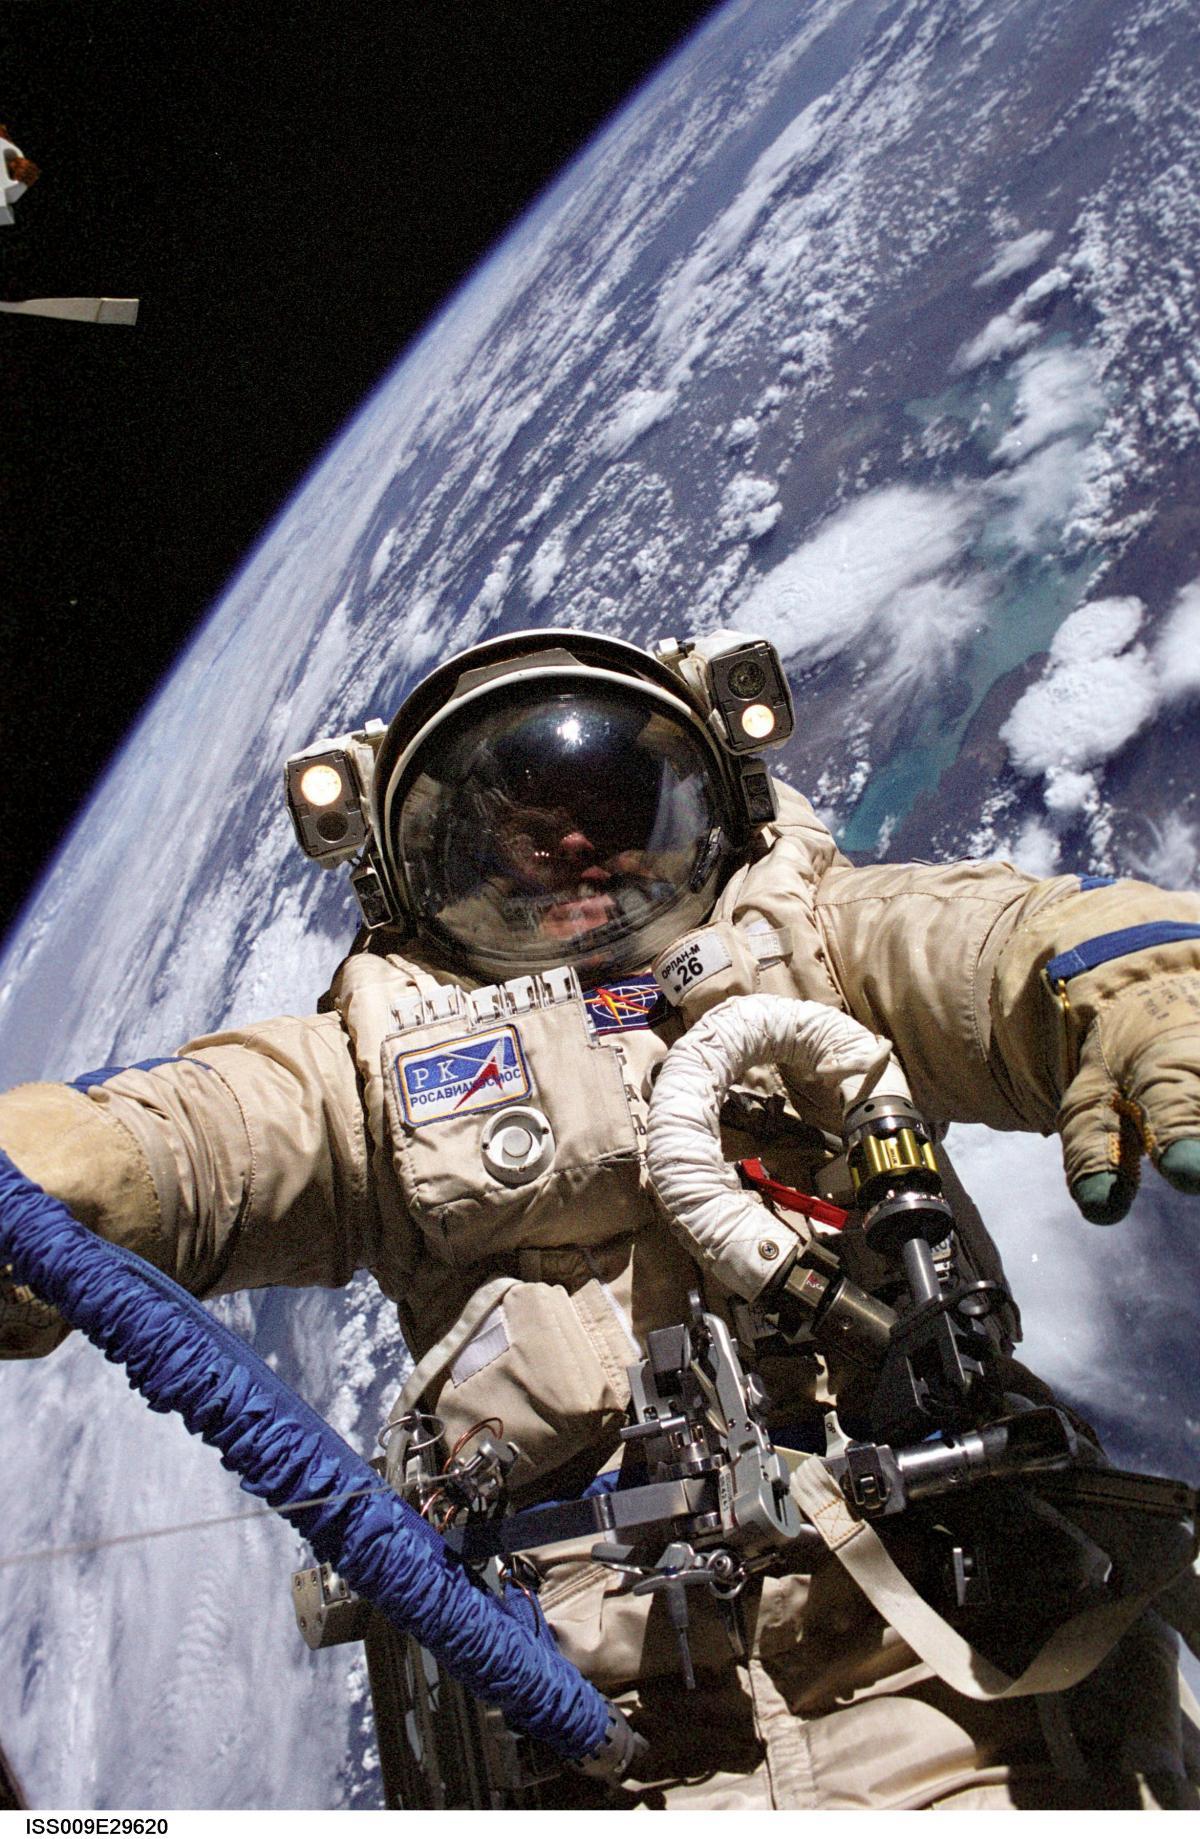 Expedition Nine Flight Engineer Fincke during EVA 3